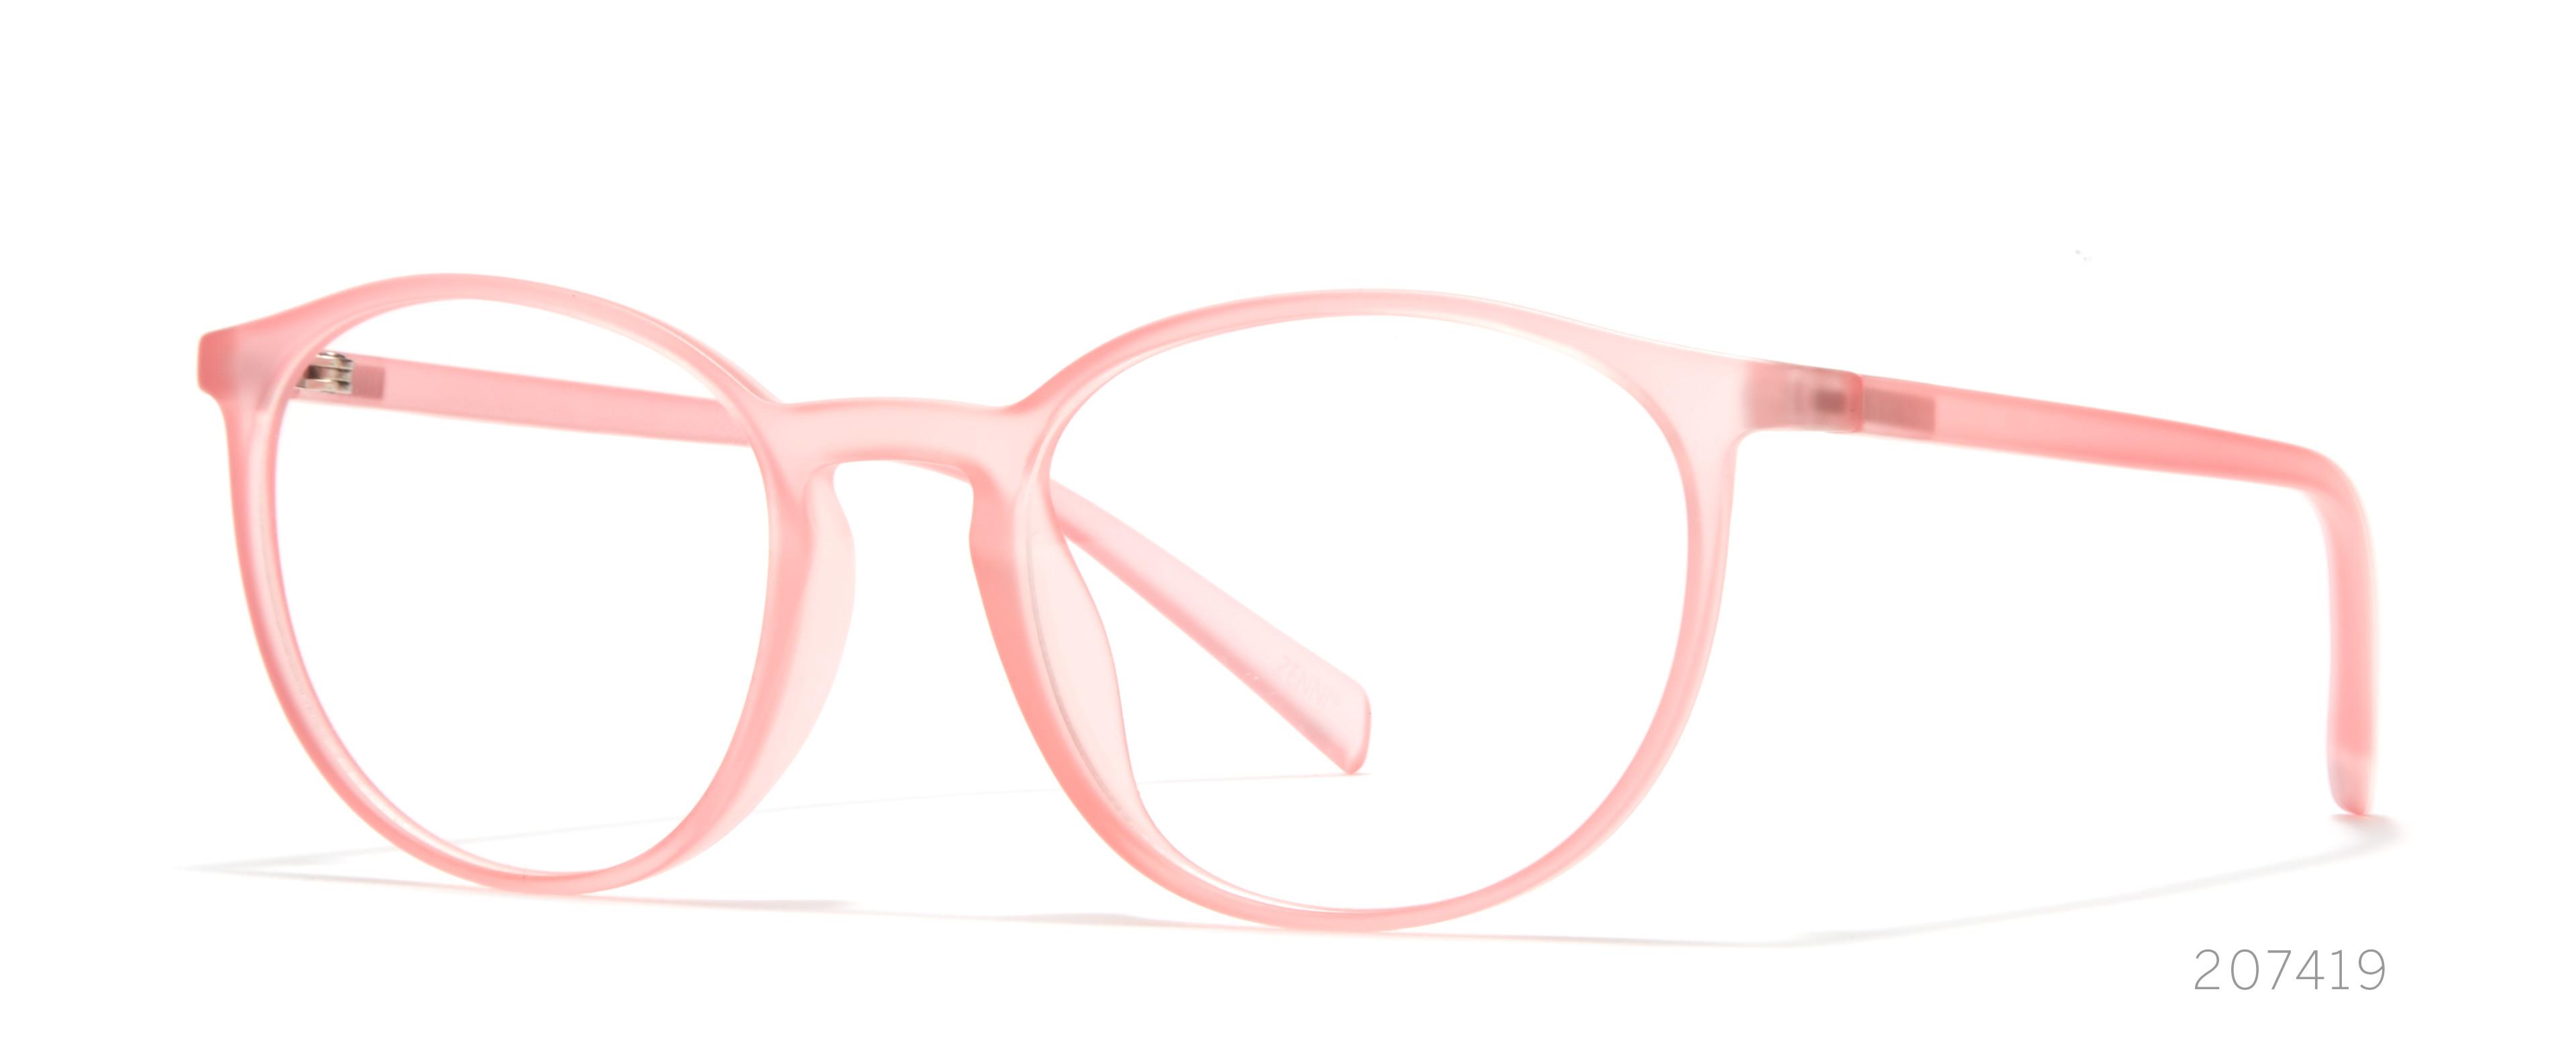 eb117d7e0a2 Wedding Eyeglasses Styles to Match Your Dress